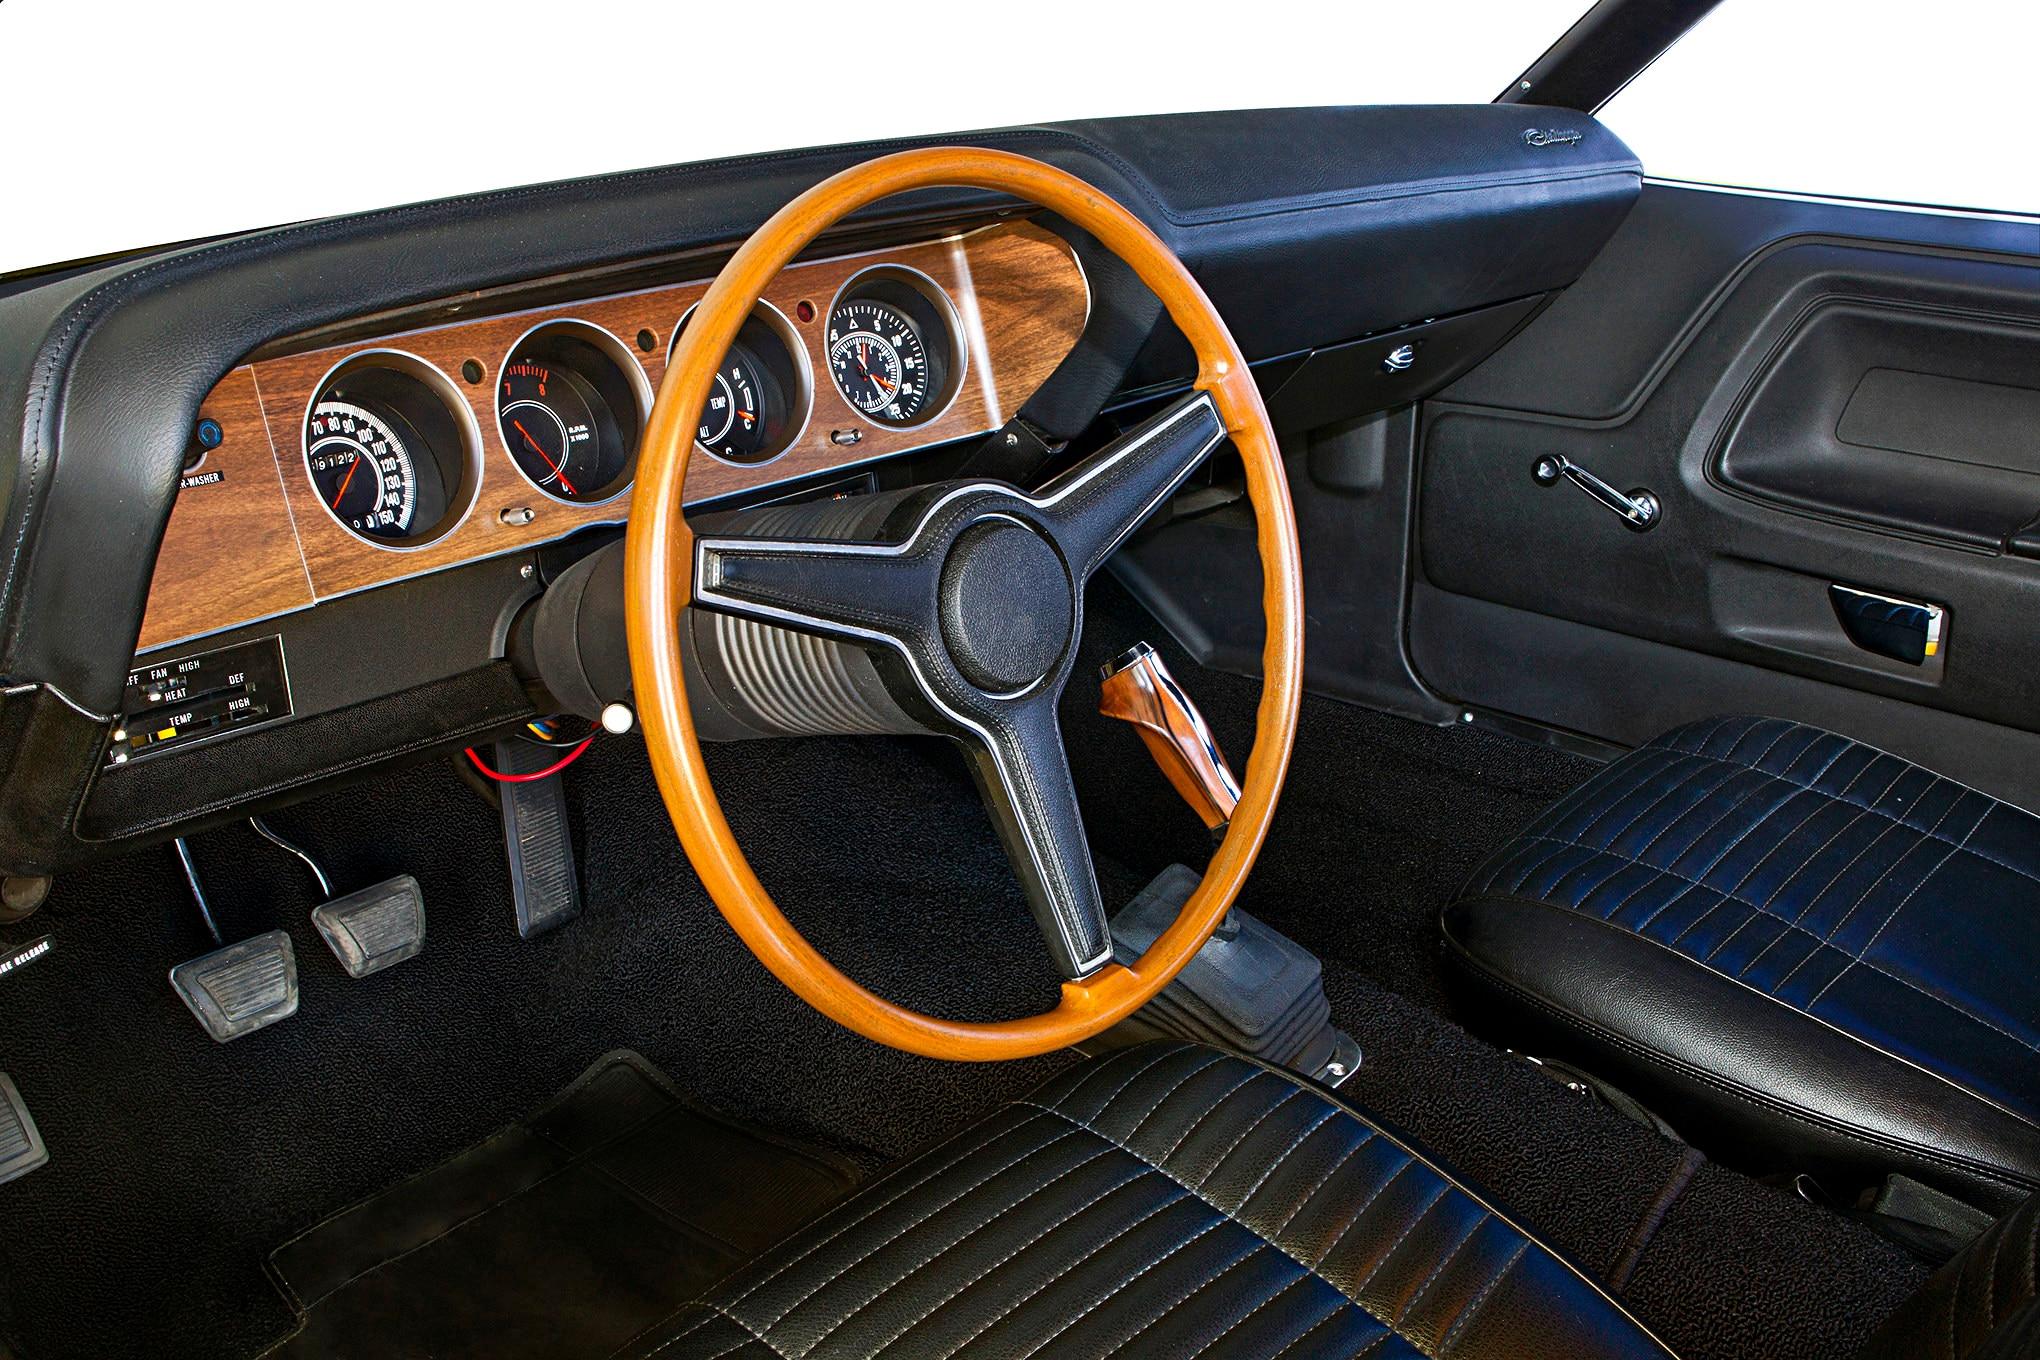 instrument-panel-gauges-1970-dodge-challenger-rt-interior